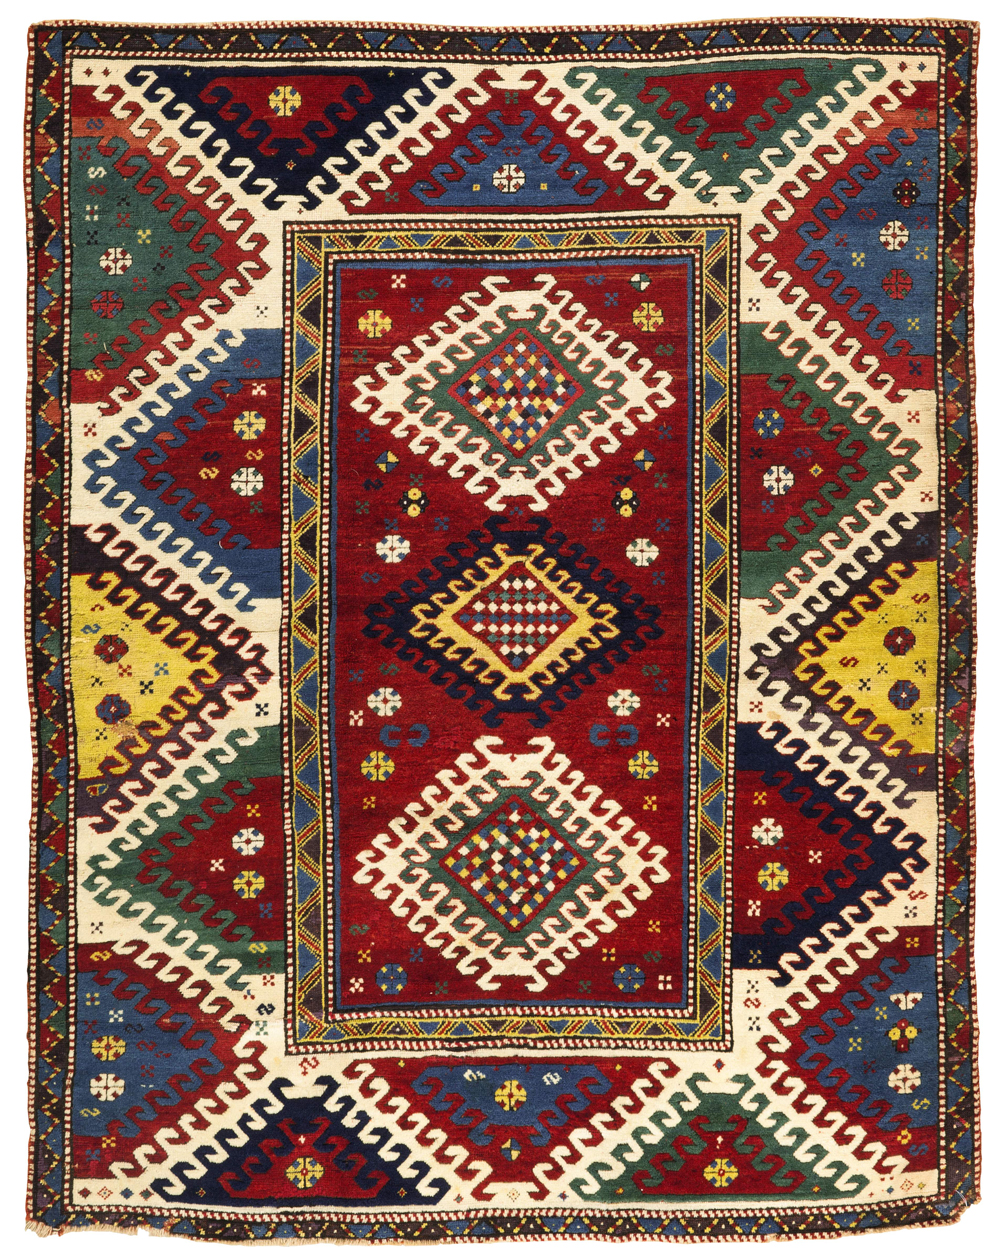 Lot 49, A Bordjalou Kazak rug, West Caucasus, Sotheby's